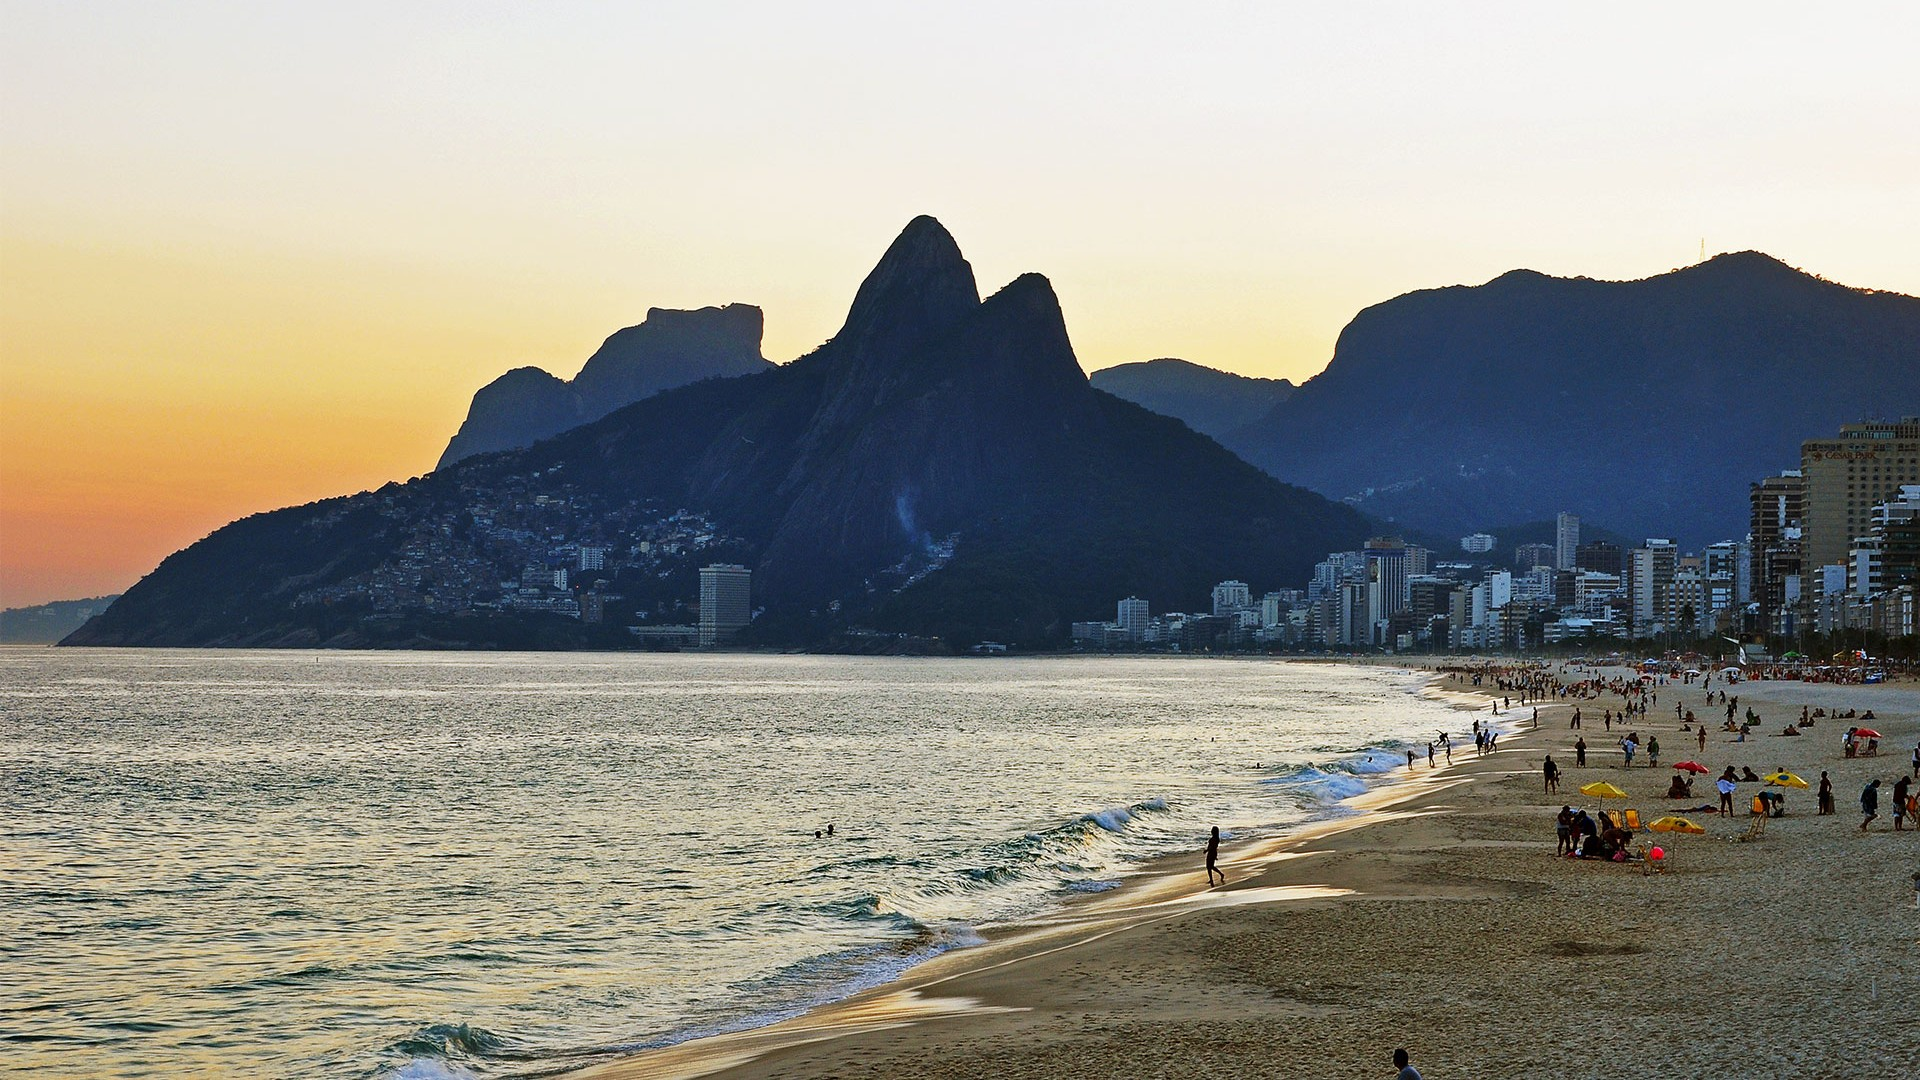 Ipaenema Beach in Rio de Janeiro